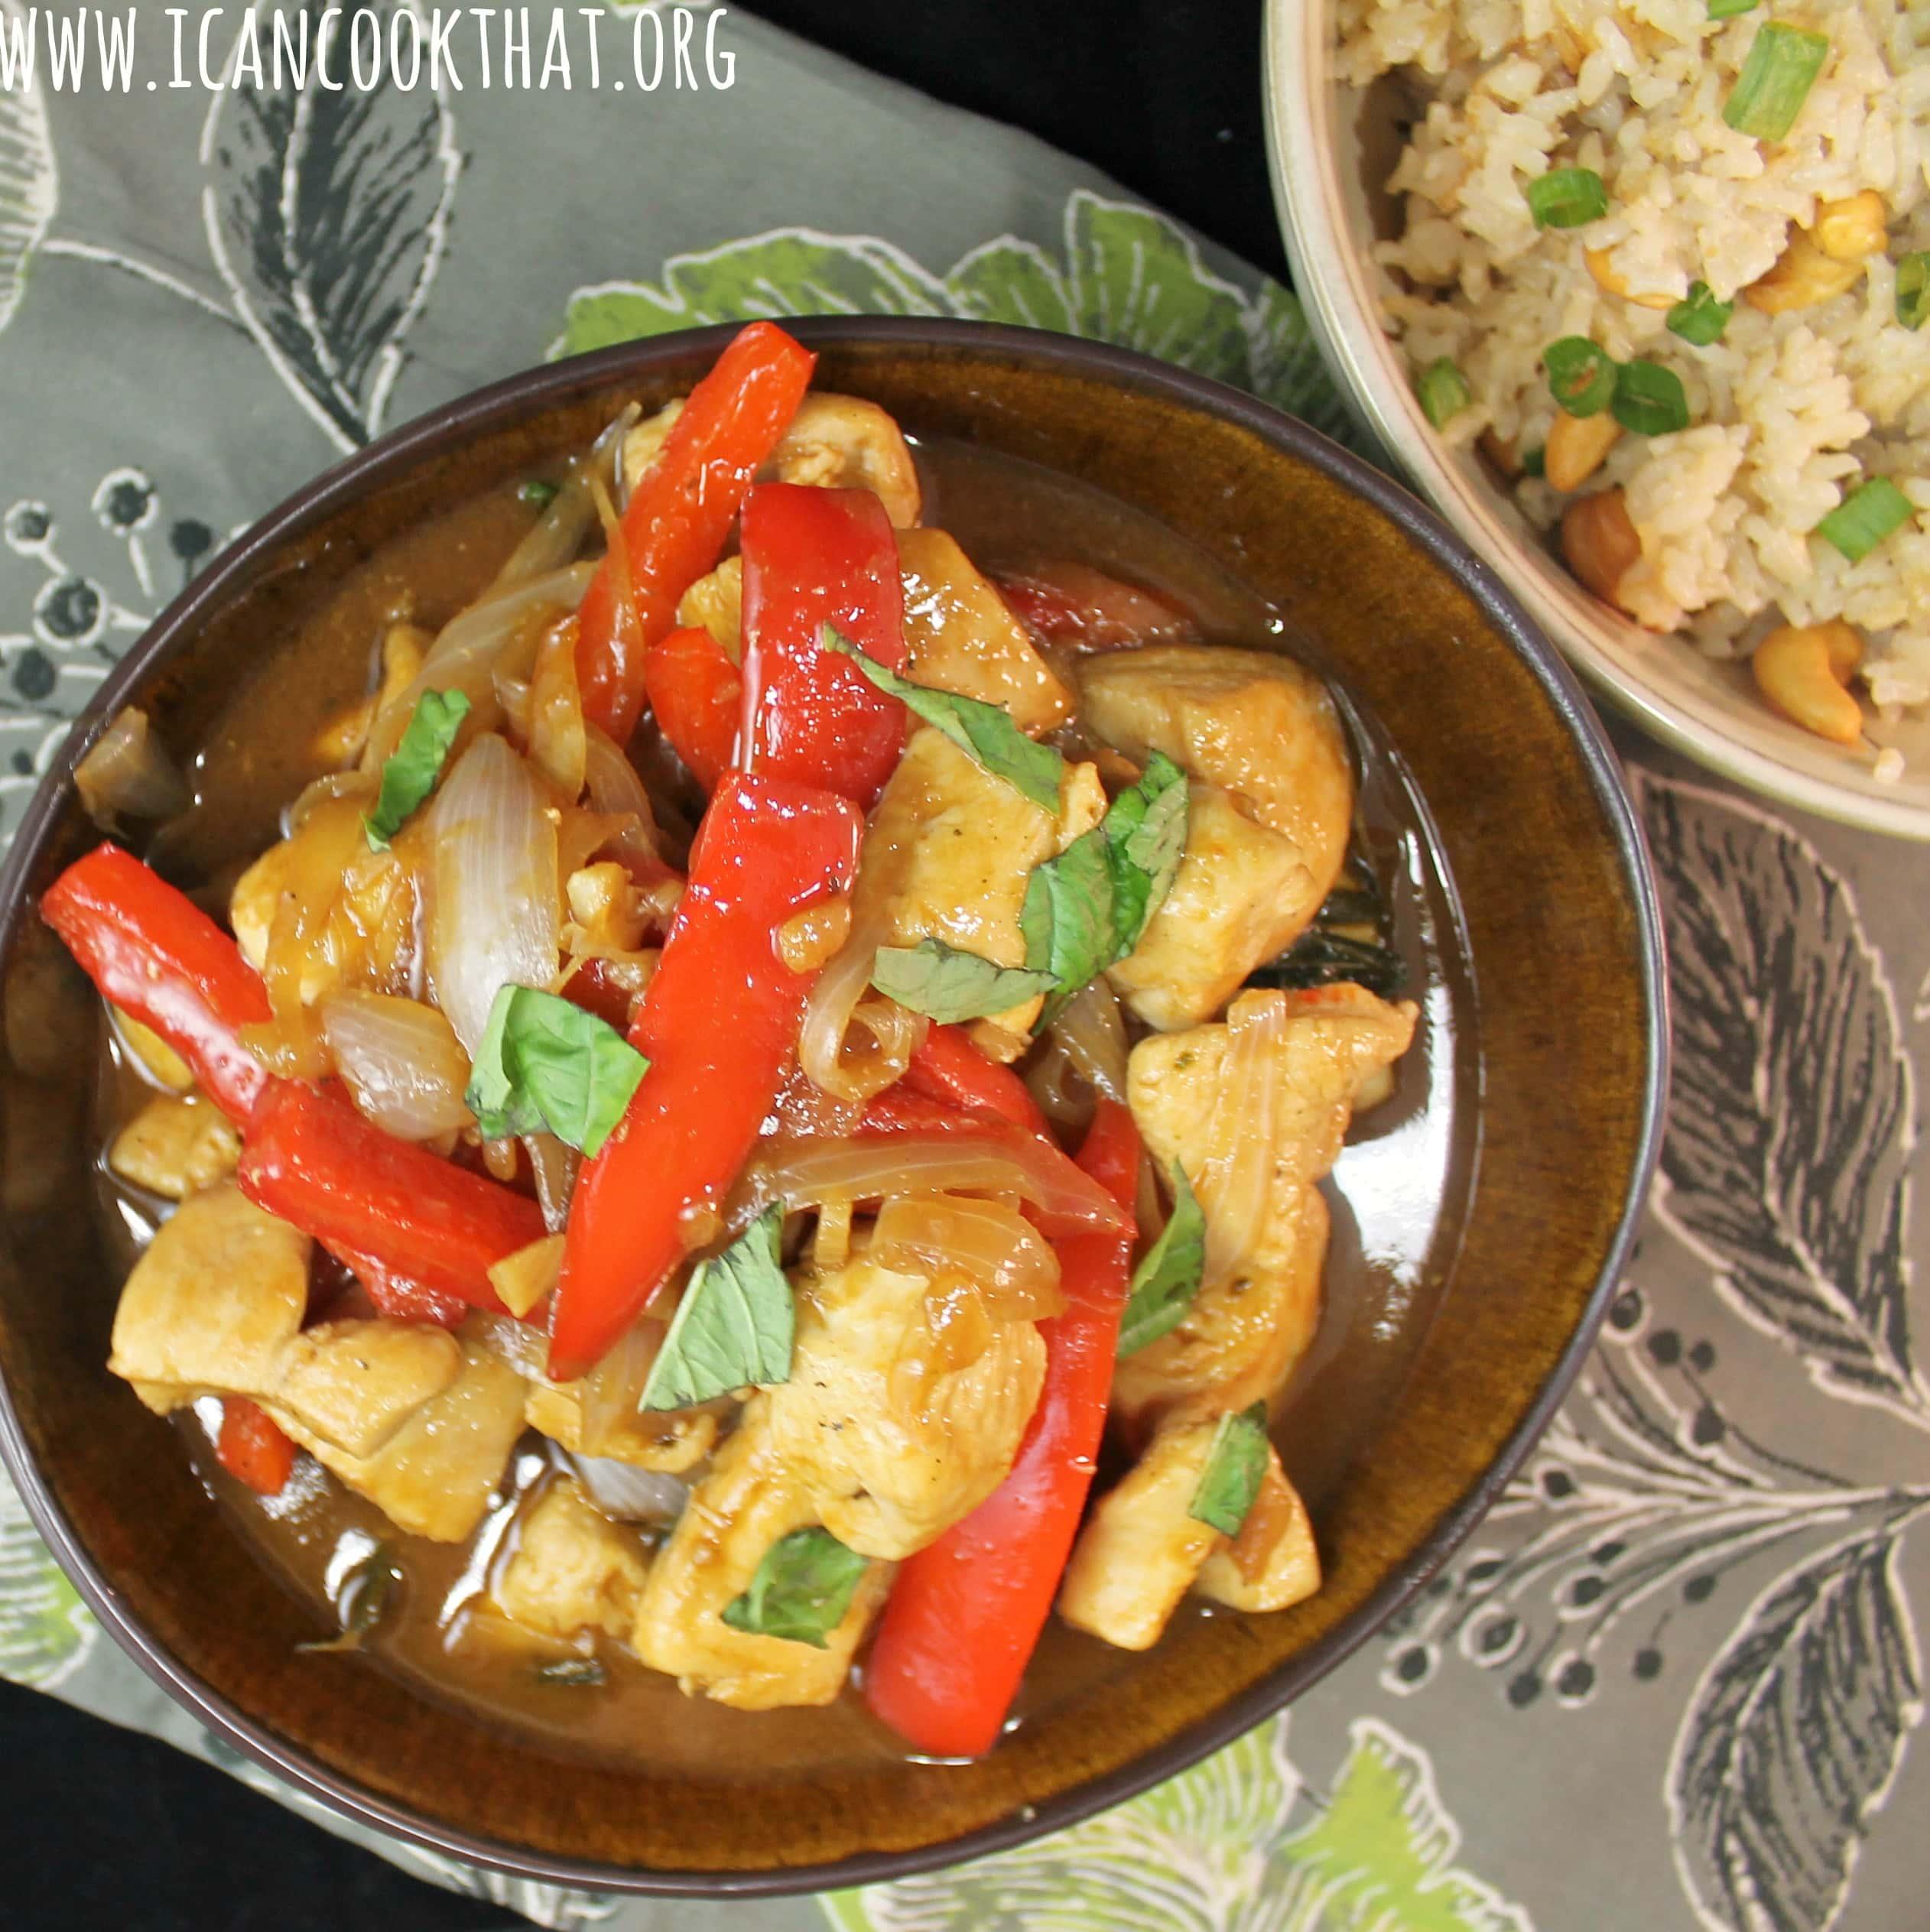 Thai Basil Chicken Stir-Fry Recipe | I Can Cook That